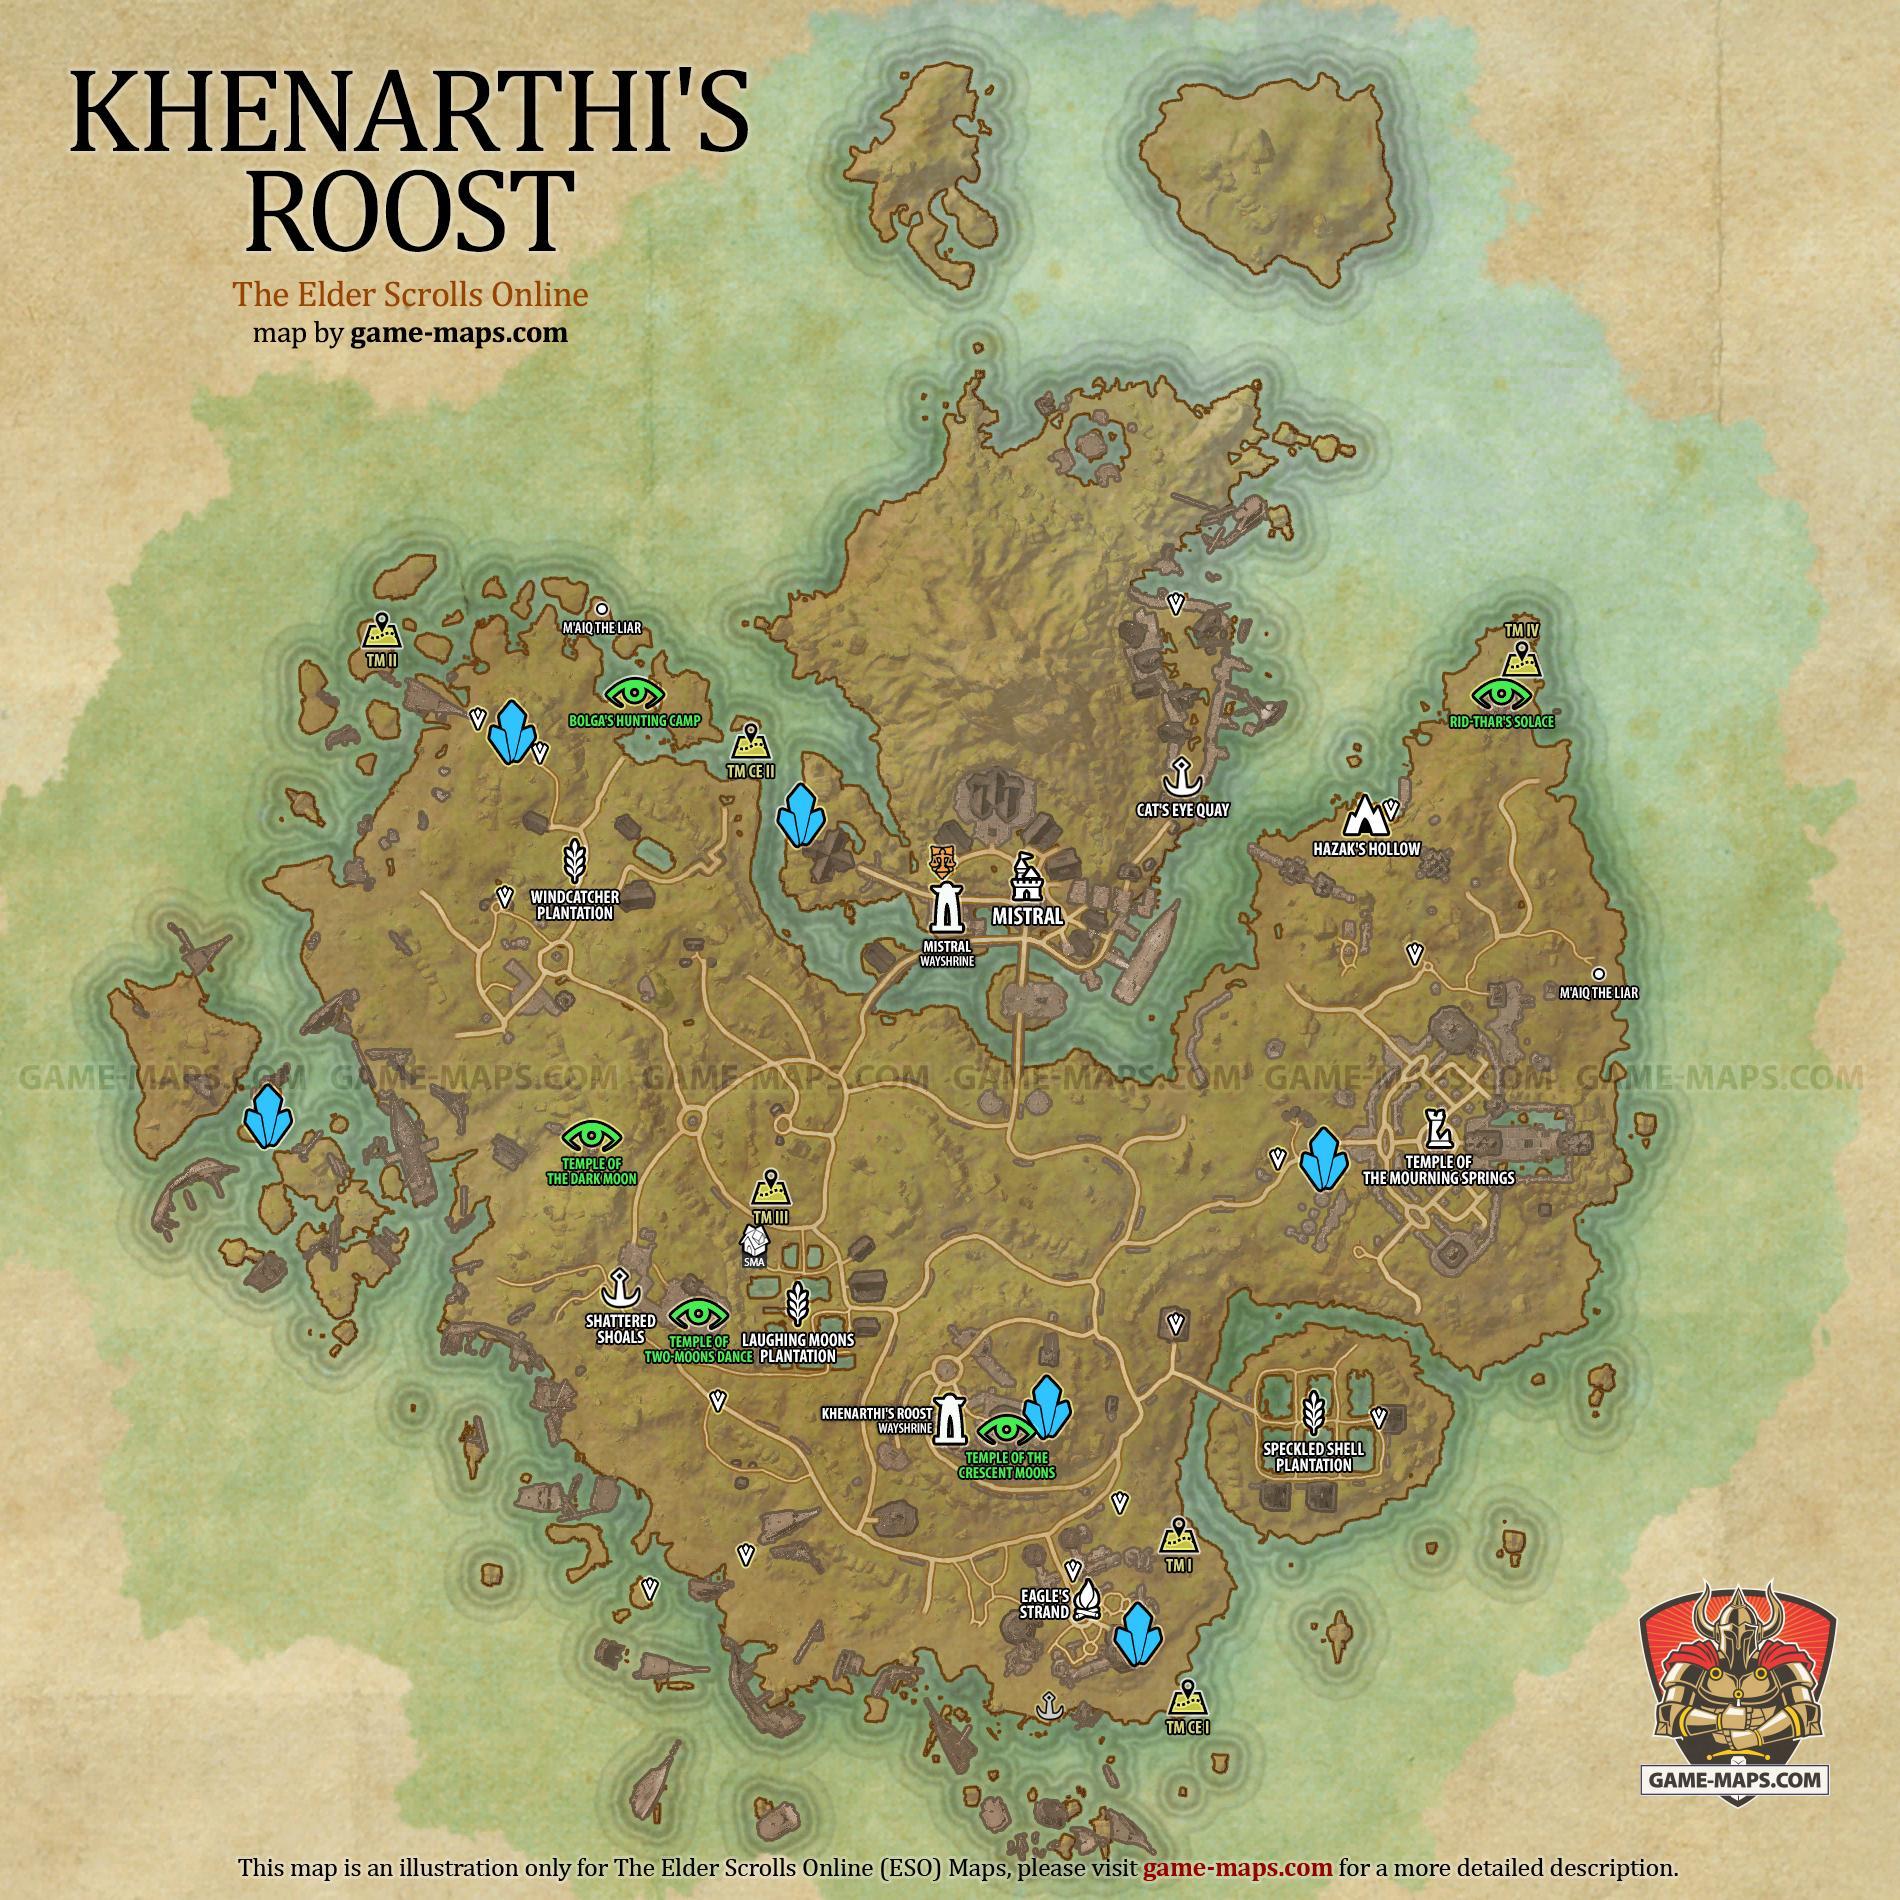 Khenarthis roost map the elder scrolls online game maps khenarthis roost zone map mistral the elder scrolls online eso maps guides walkthroughs gumiabroncs Images